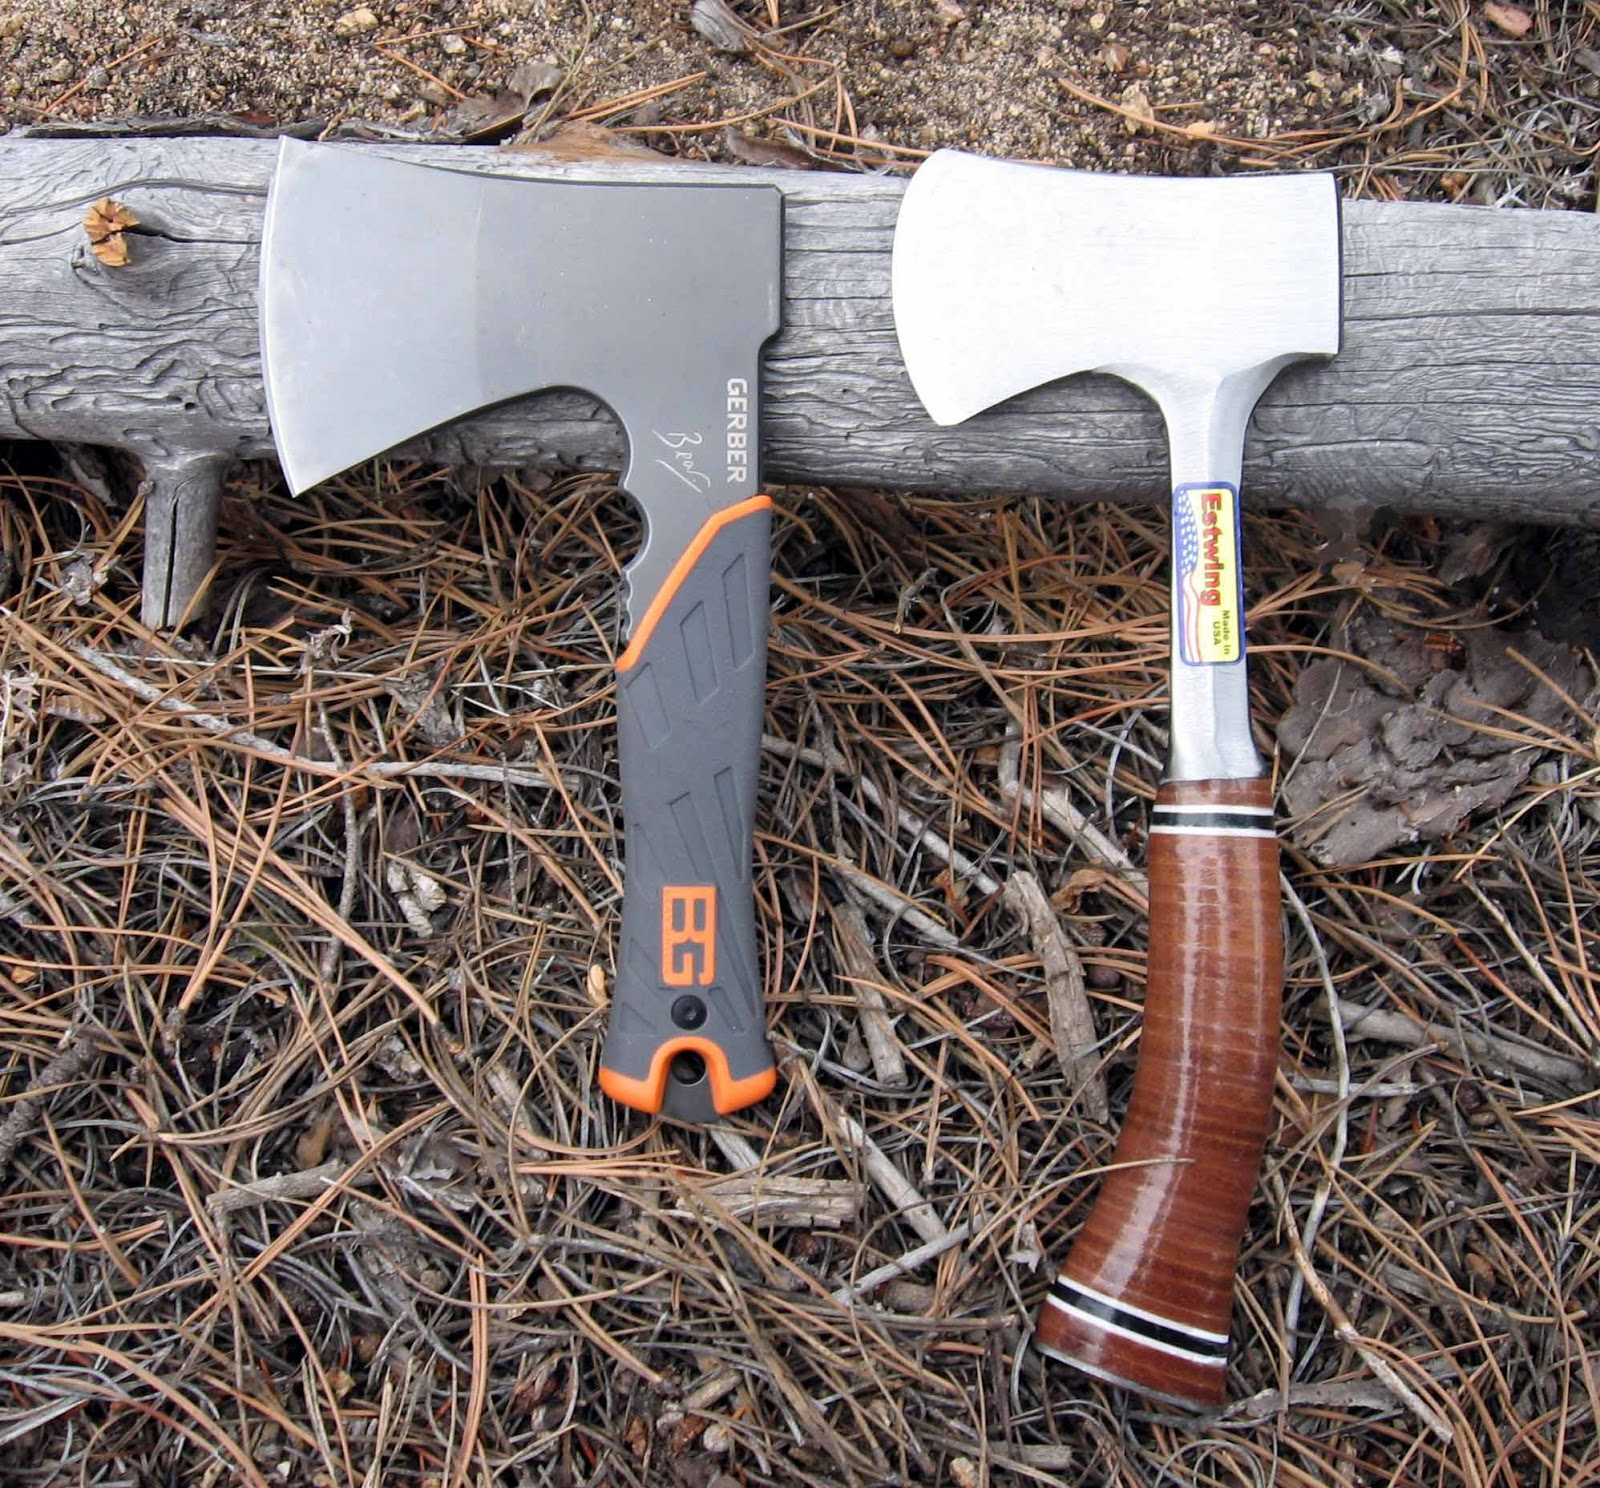 Norlund Camping Hatchet Axe Wood Tool Single Bit Tomahawk ...  |Hatchet